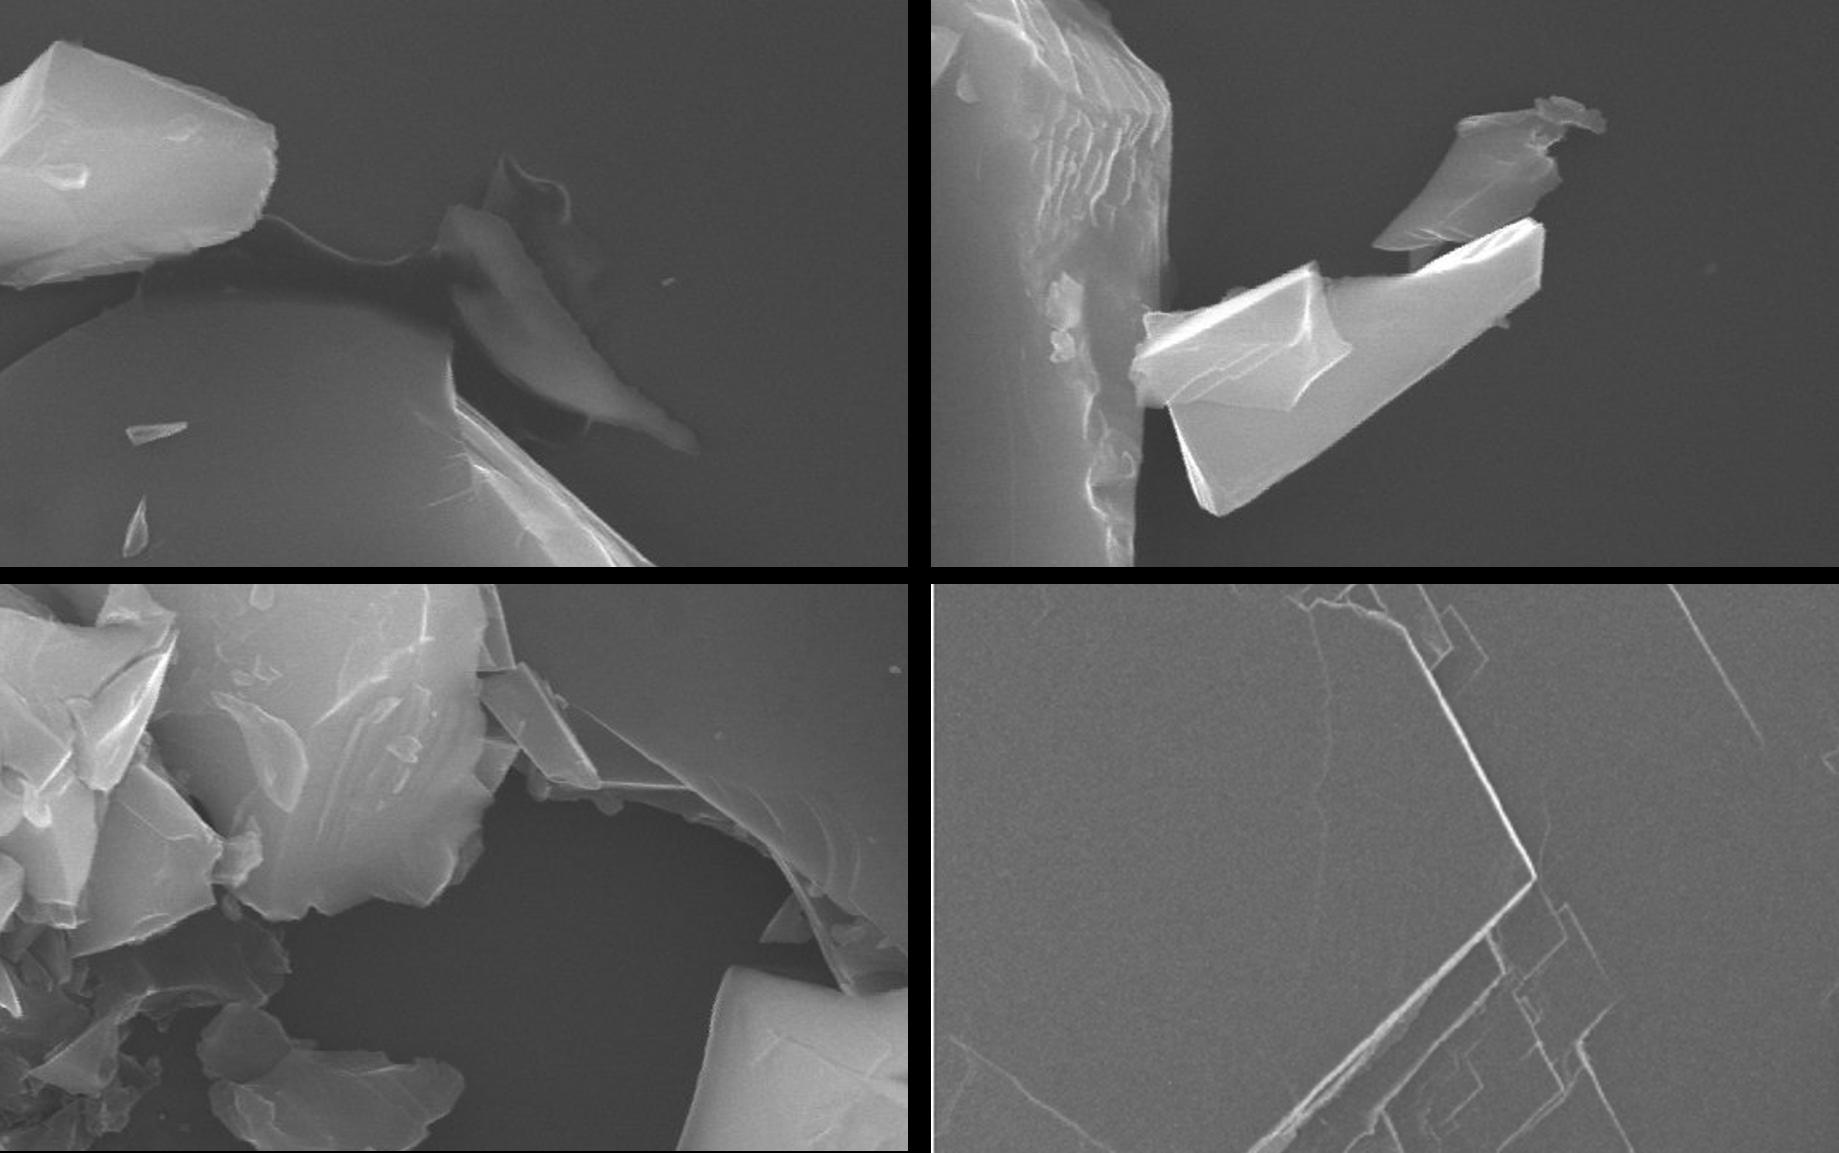 2d-solution-sem-images.png